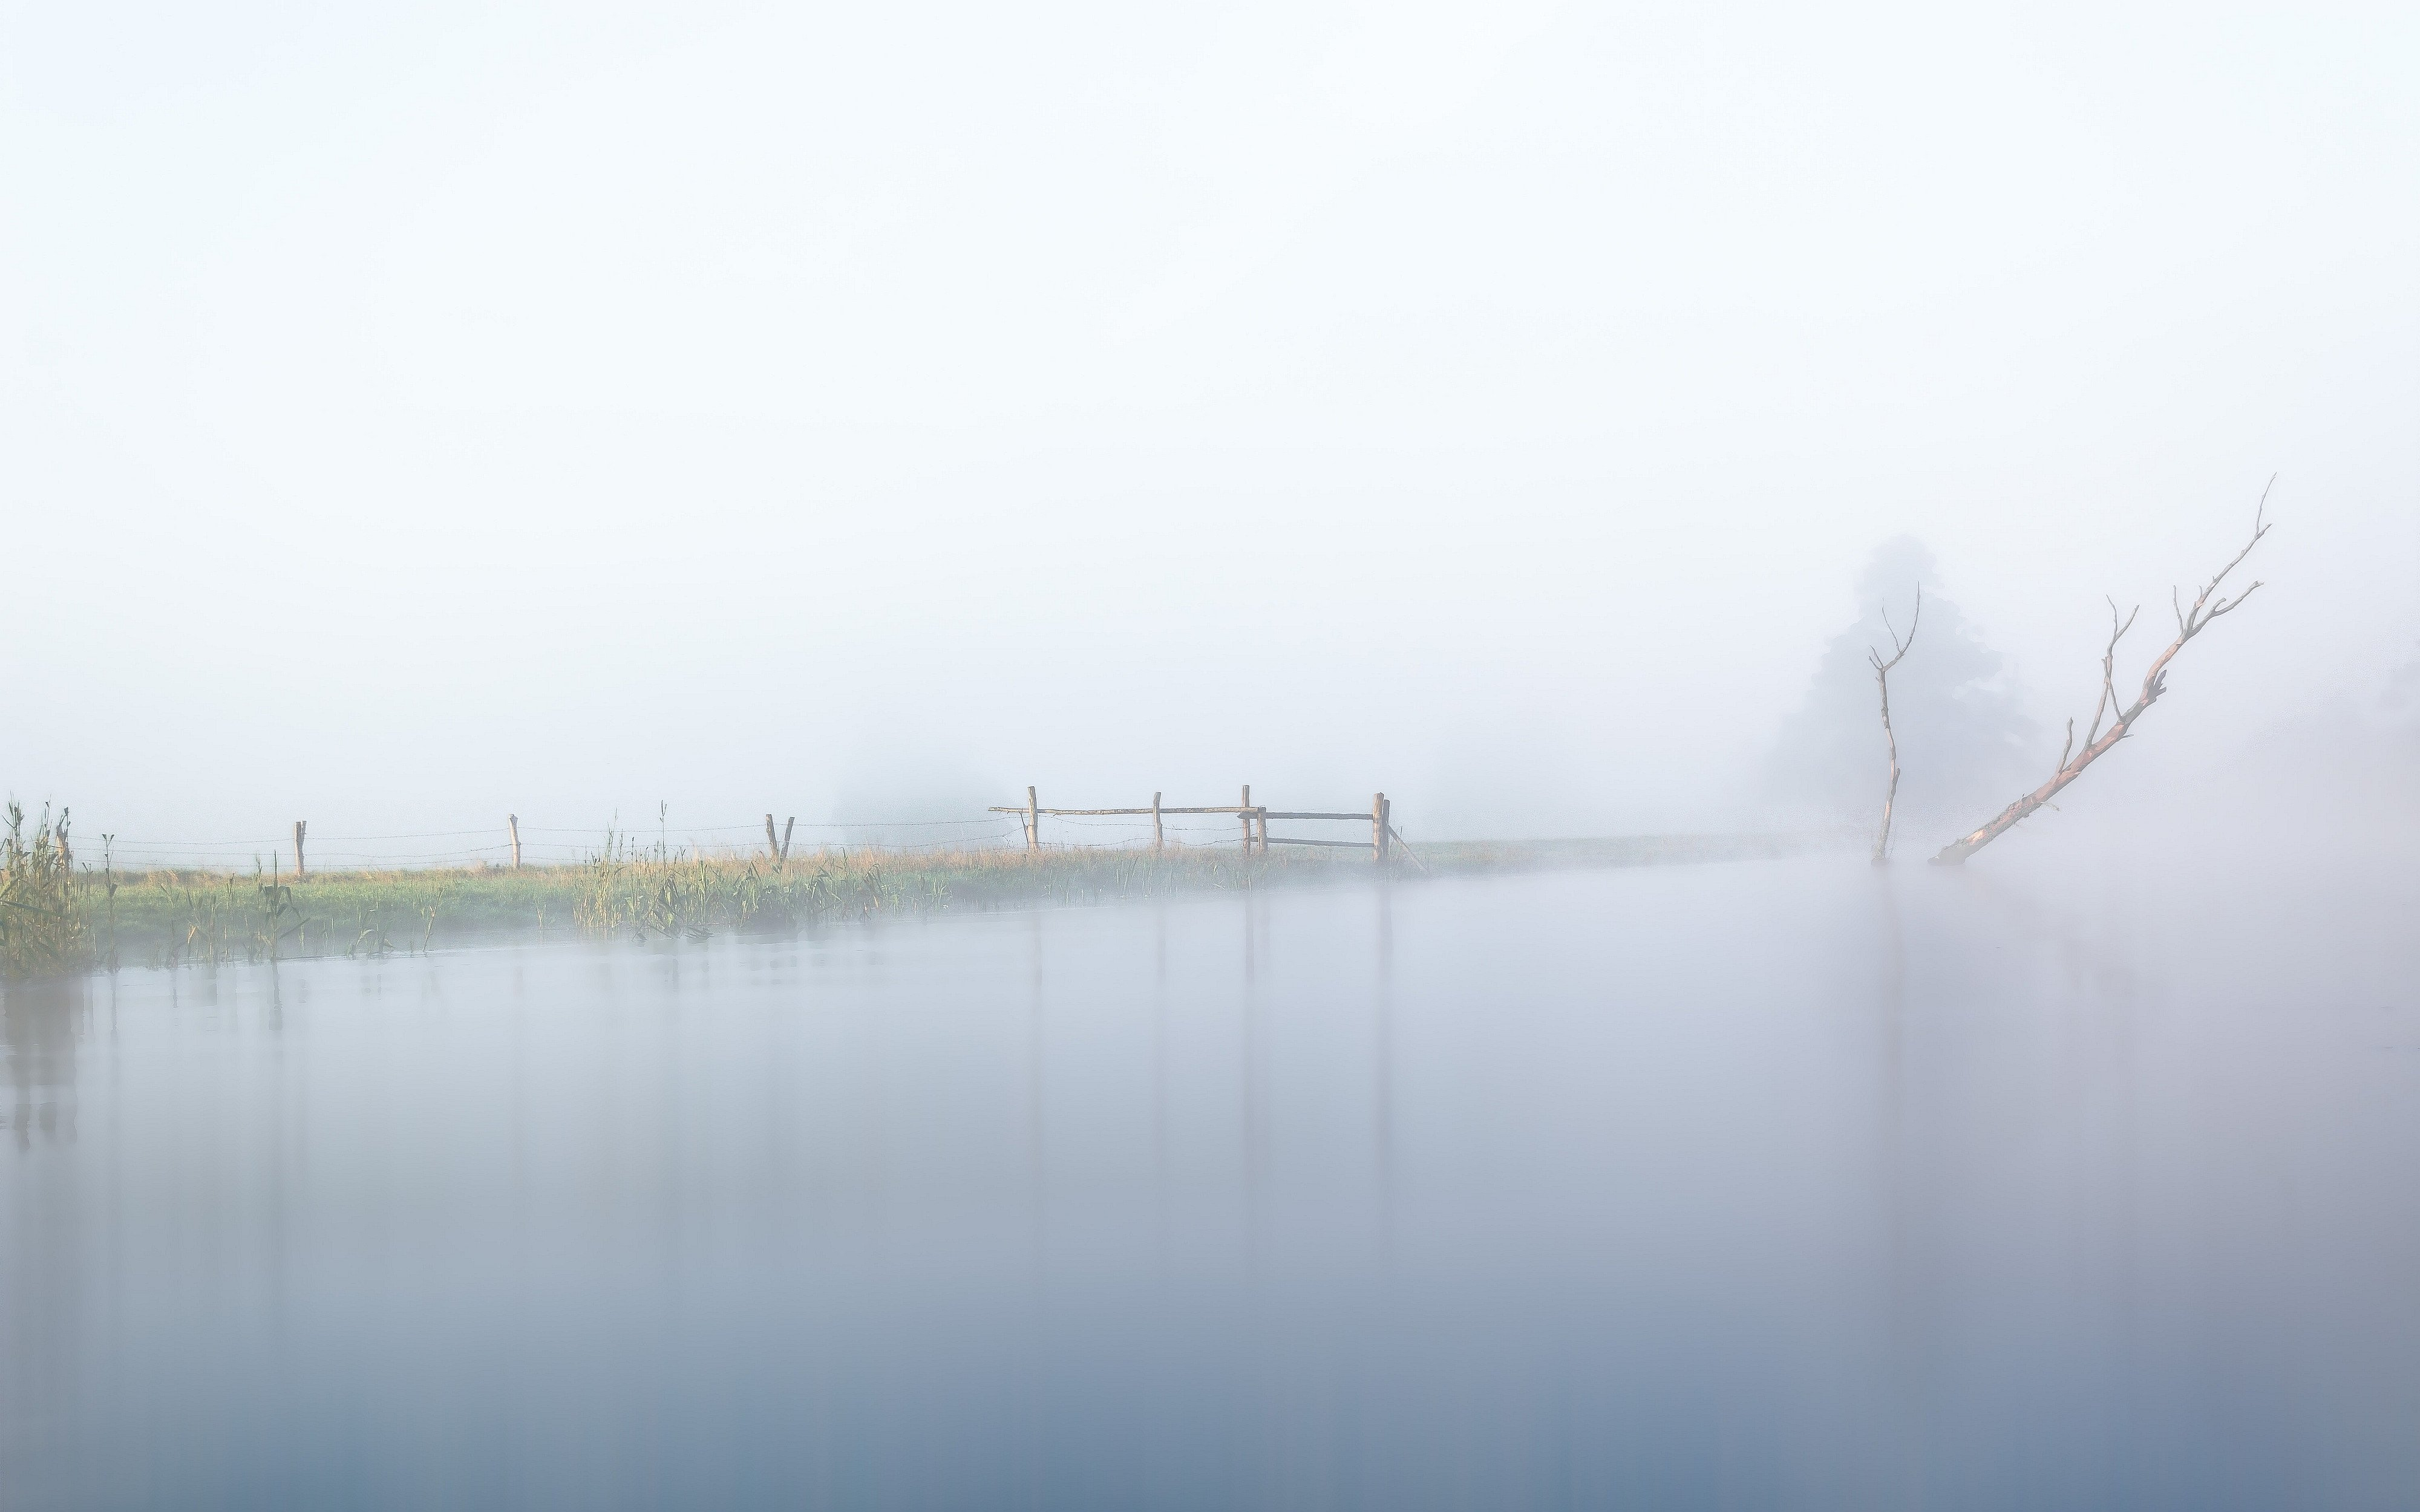 dawn,fog,sky,river,gwda,nature,landscape,tree,pasture,summer,nikon,water,, Krzysztof Tollas